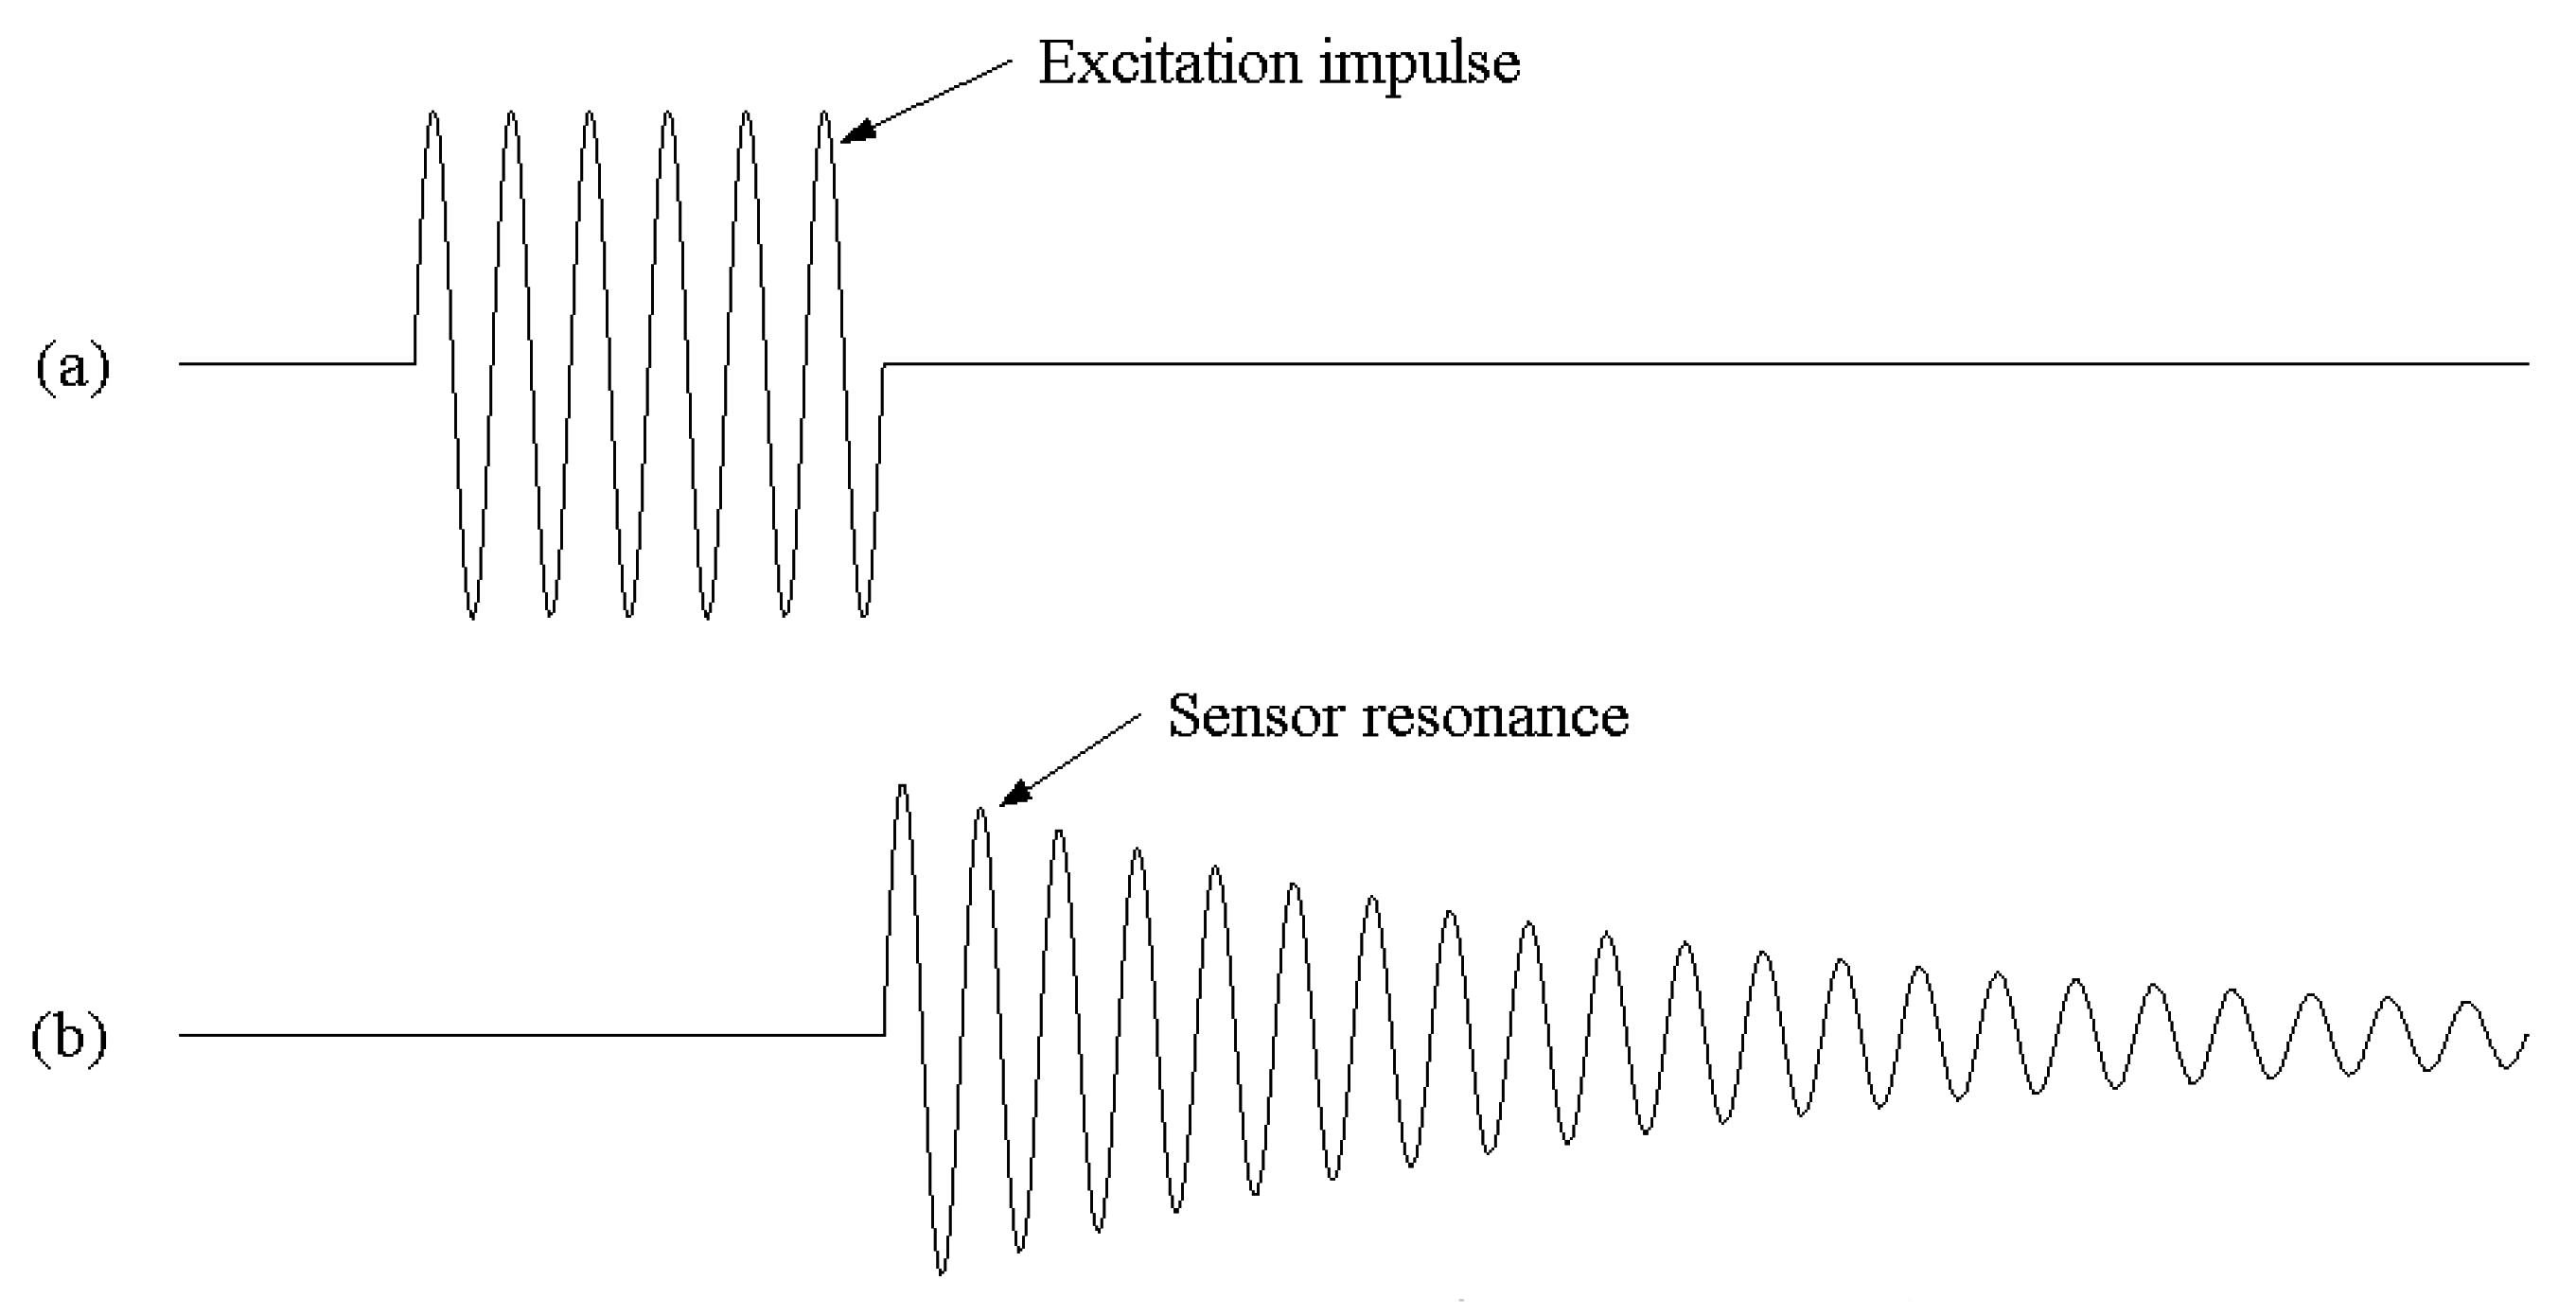 Sensors Free Full Text Wireless Magnetoelastic Resonance Inductive Proximity Sensor Comprising A Resonant Oscillatory Circuit 02 00294 G004